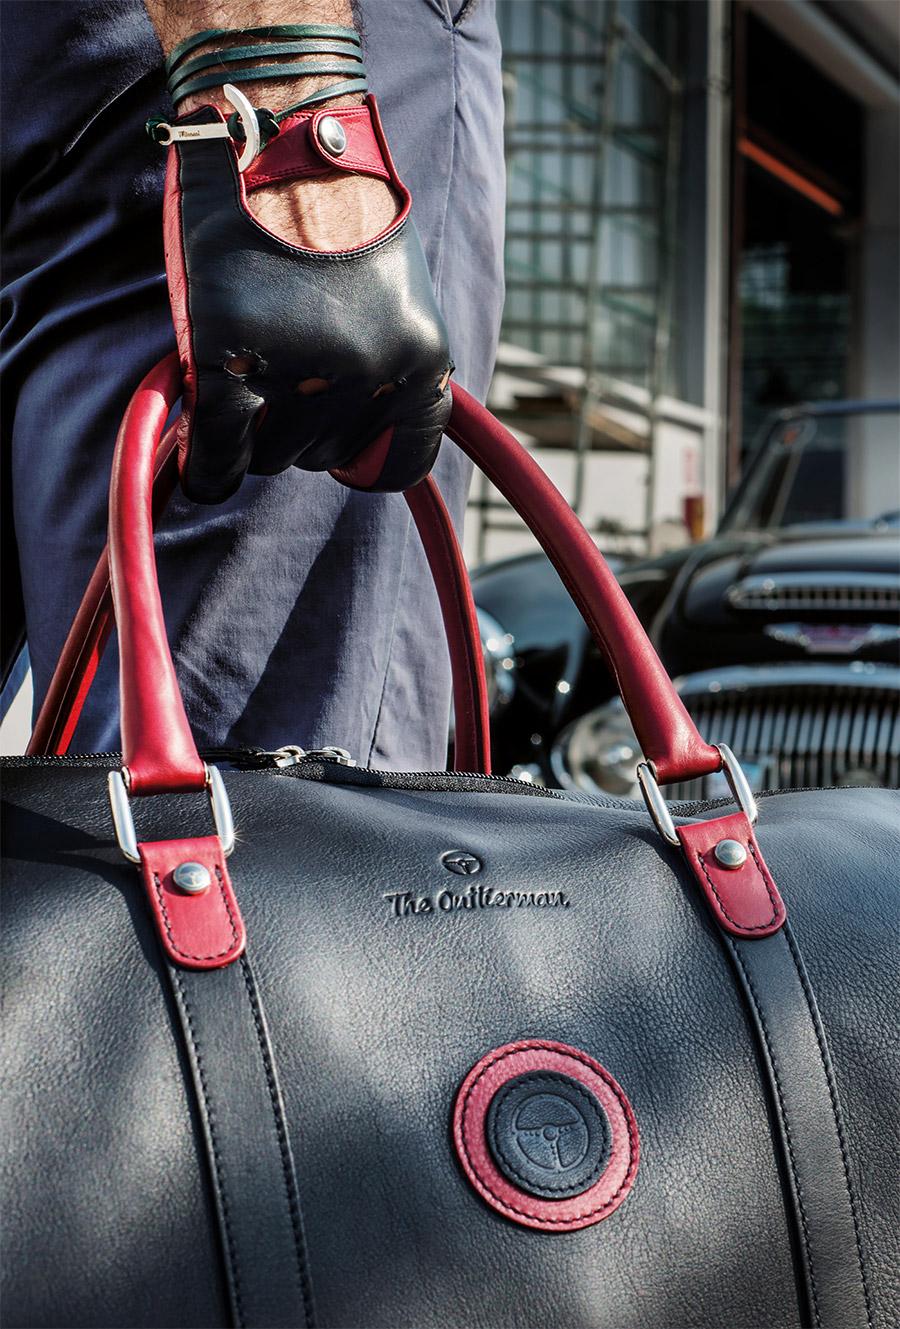 The Outlierman Custom Travel Bag Set